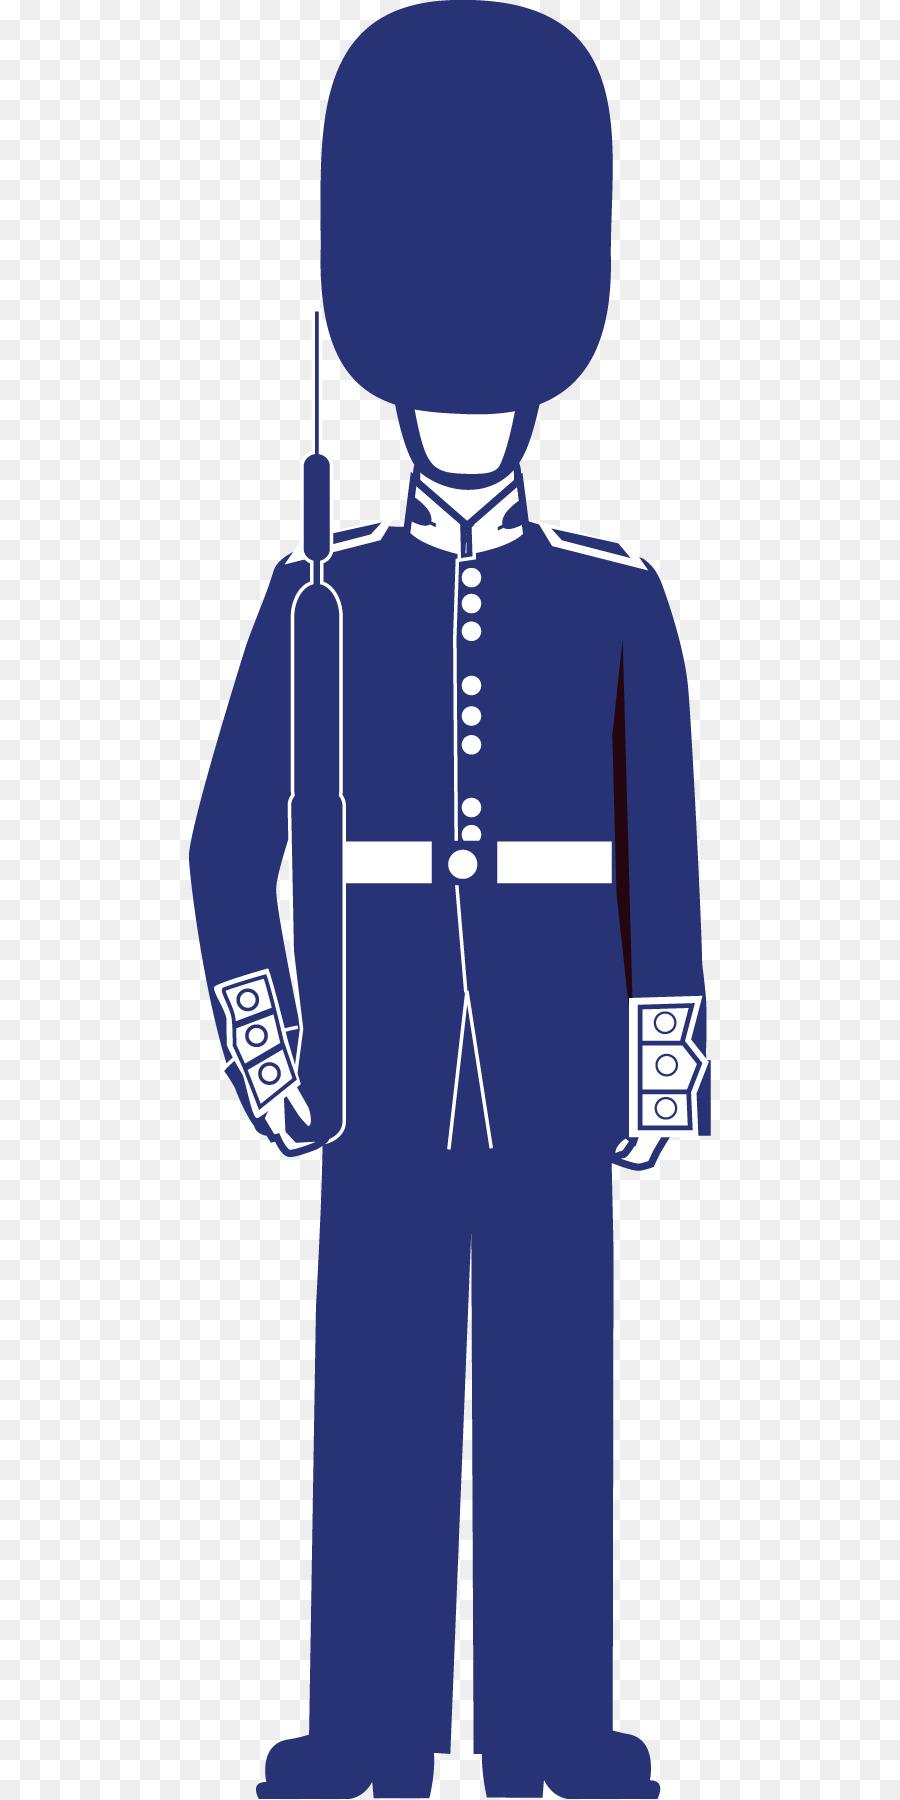 1997 Ford Explorer 2001 Diagram Organization Clip Art Wiring London Royal Guard